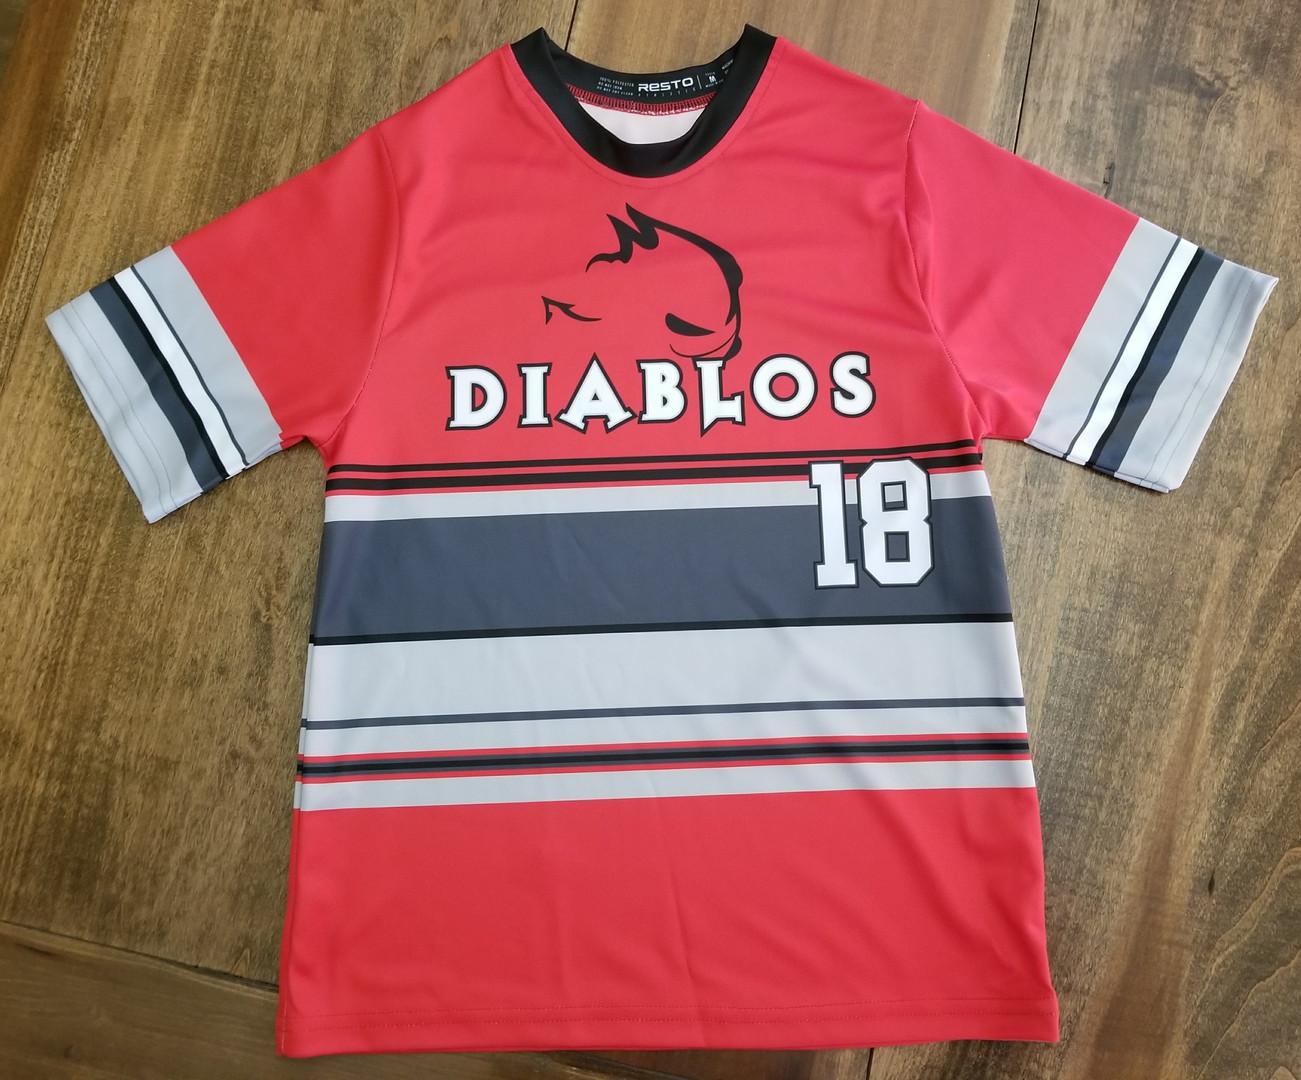 Diablos Stripes.jpg